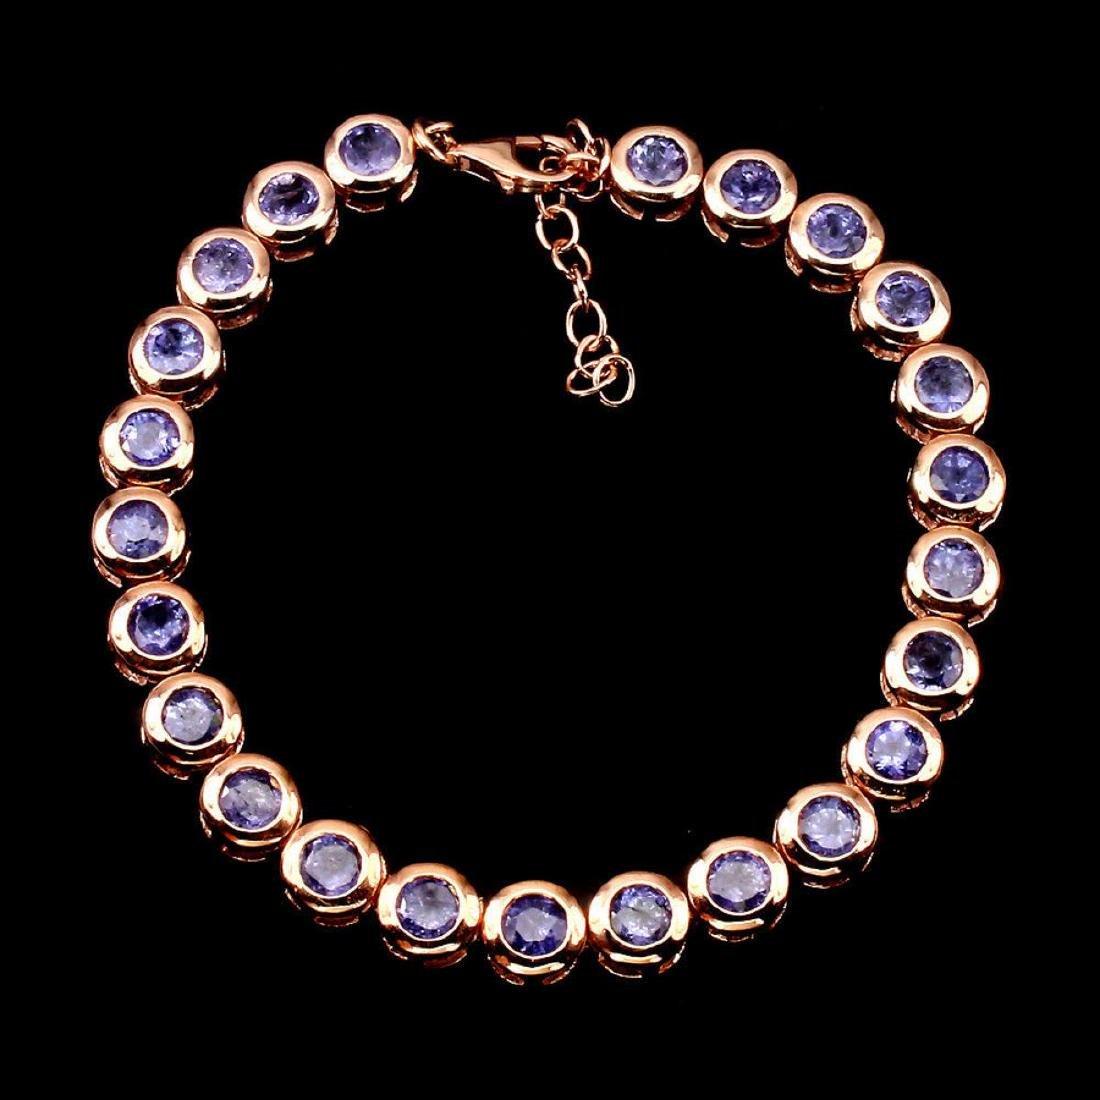 Natural Rich Blue Violet Tanzanite 86.35 CtBracelet